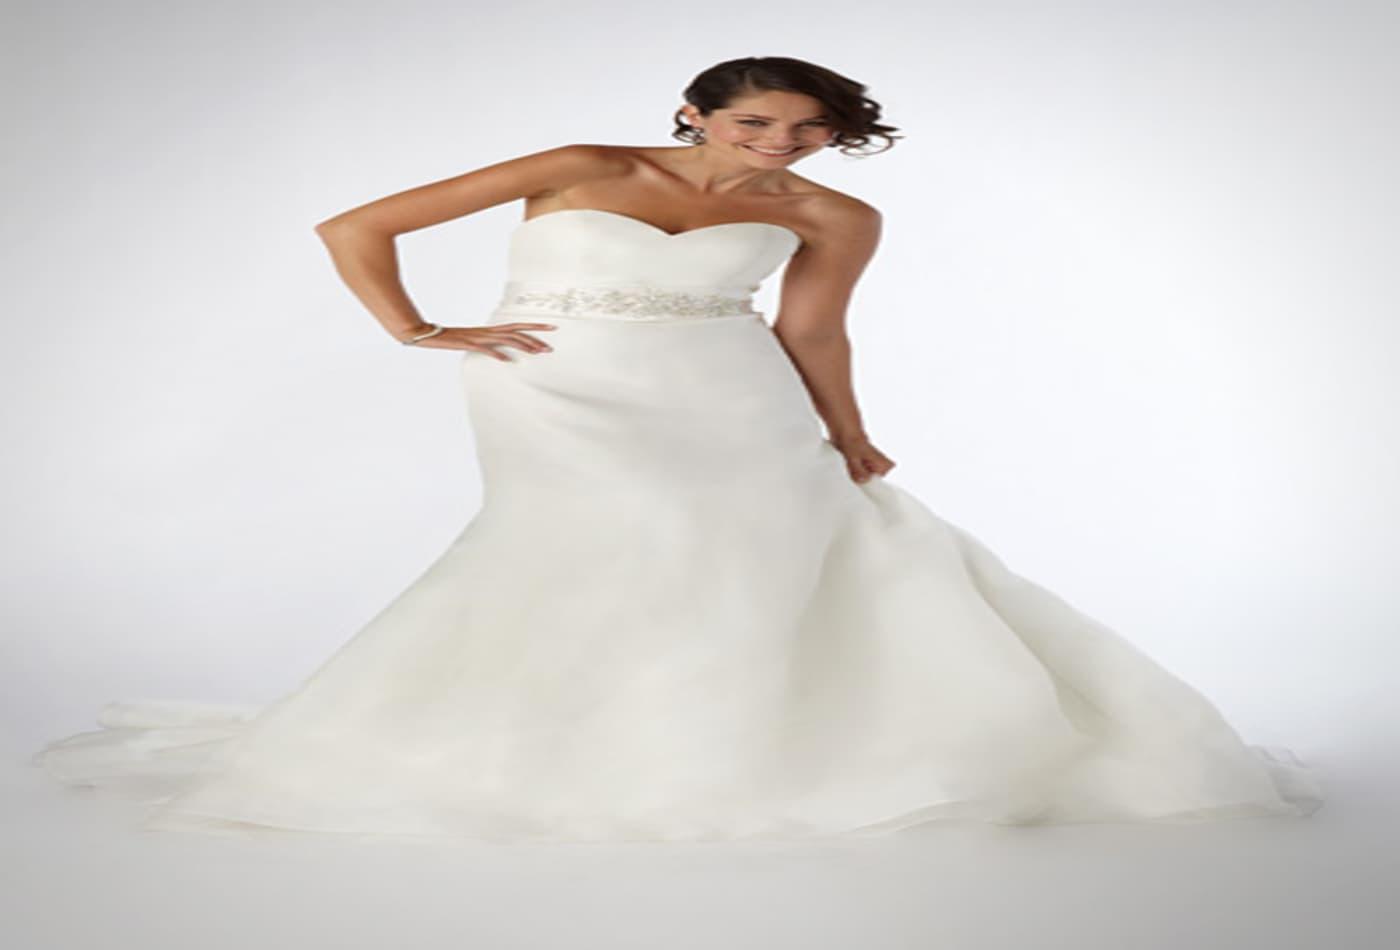 cosco-wedding-wedding-gown.jpg